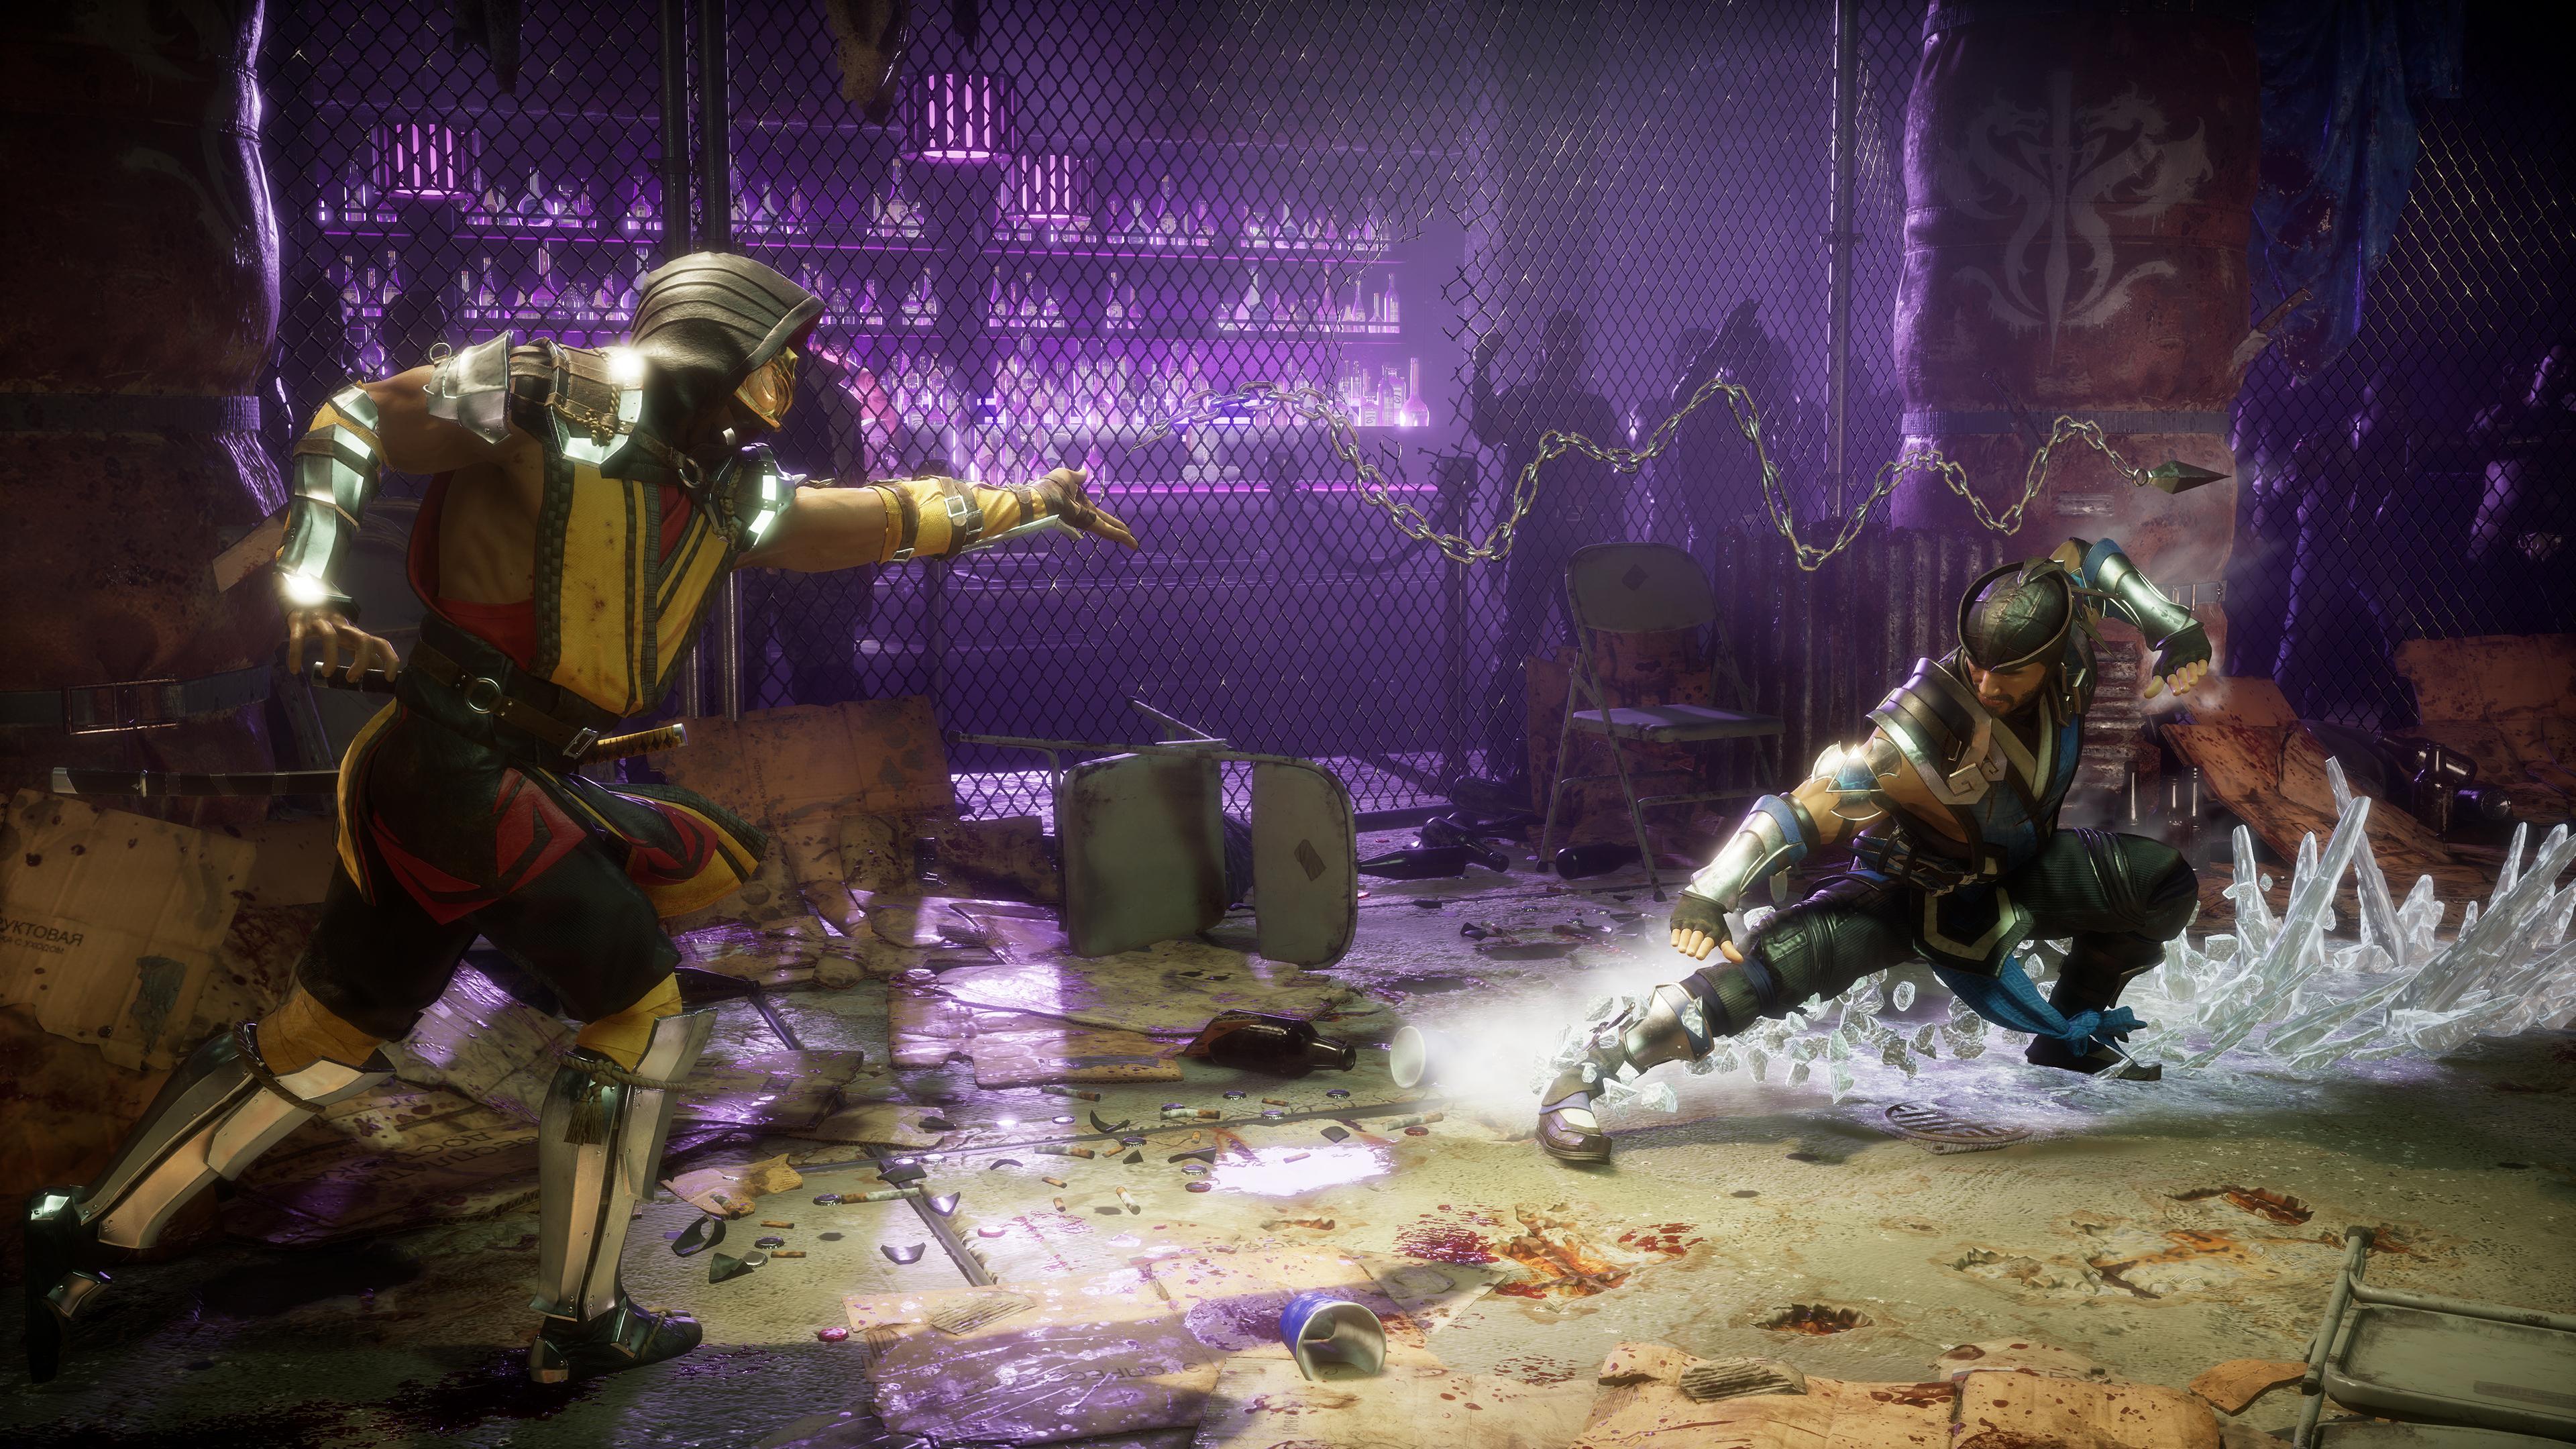 Скриншот №4 к Ultimate-издание Mortal Kombat11 PS4 and PS5